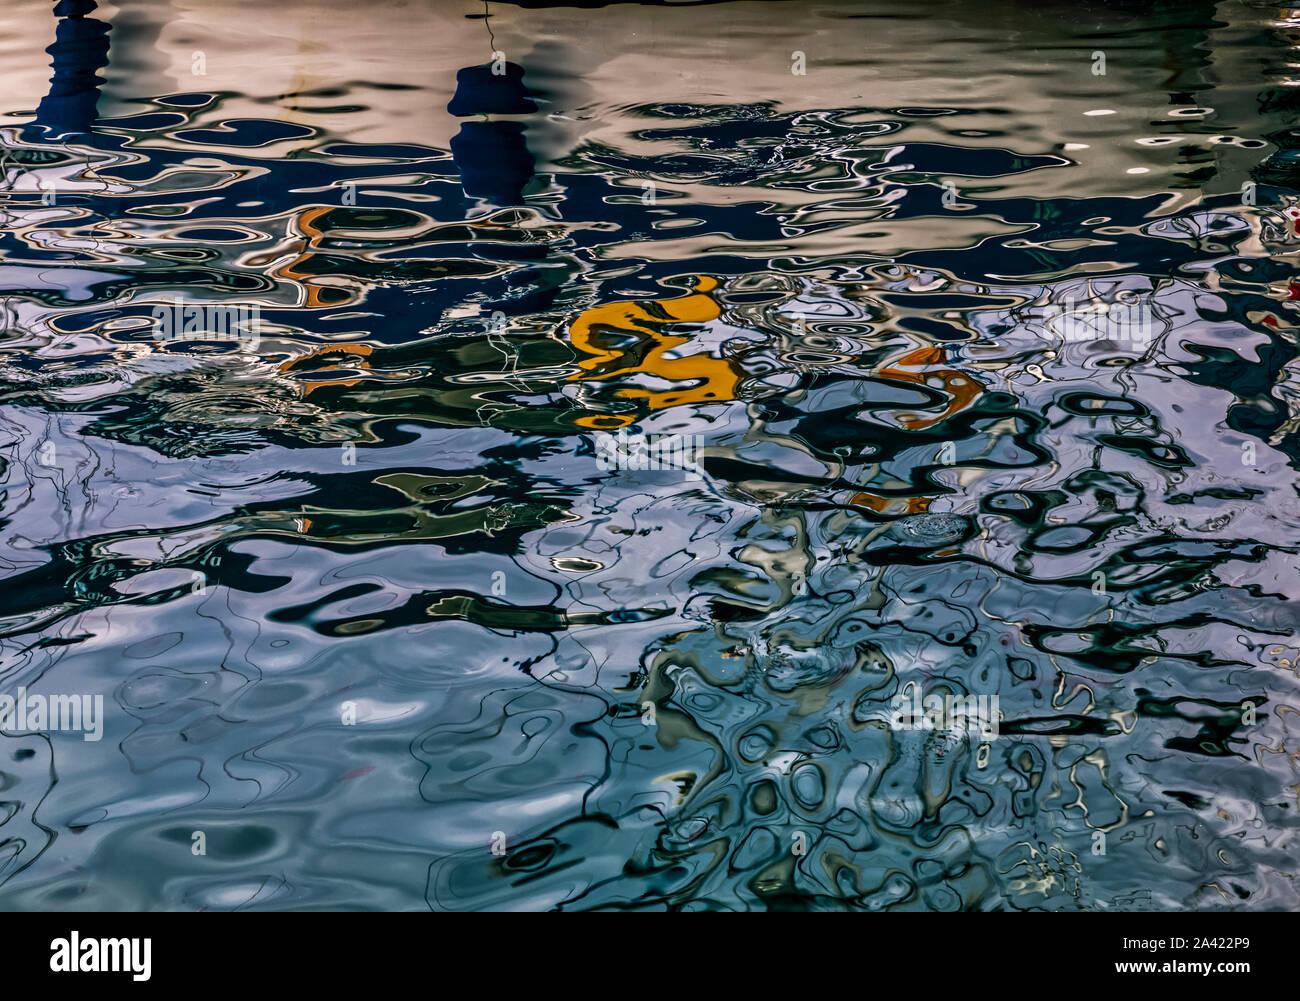 Surface of dark ripples on Aegean Sea . Interplay  of dark blue, white, and orange  reflections. Stock Image. Stock Photo